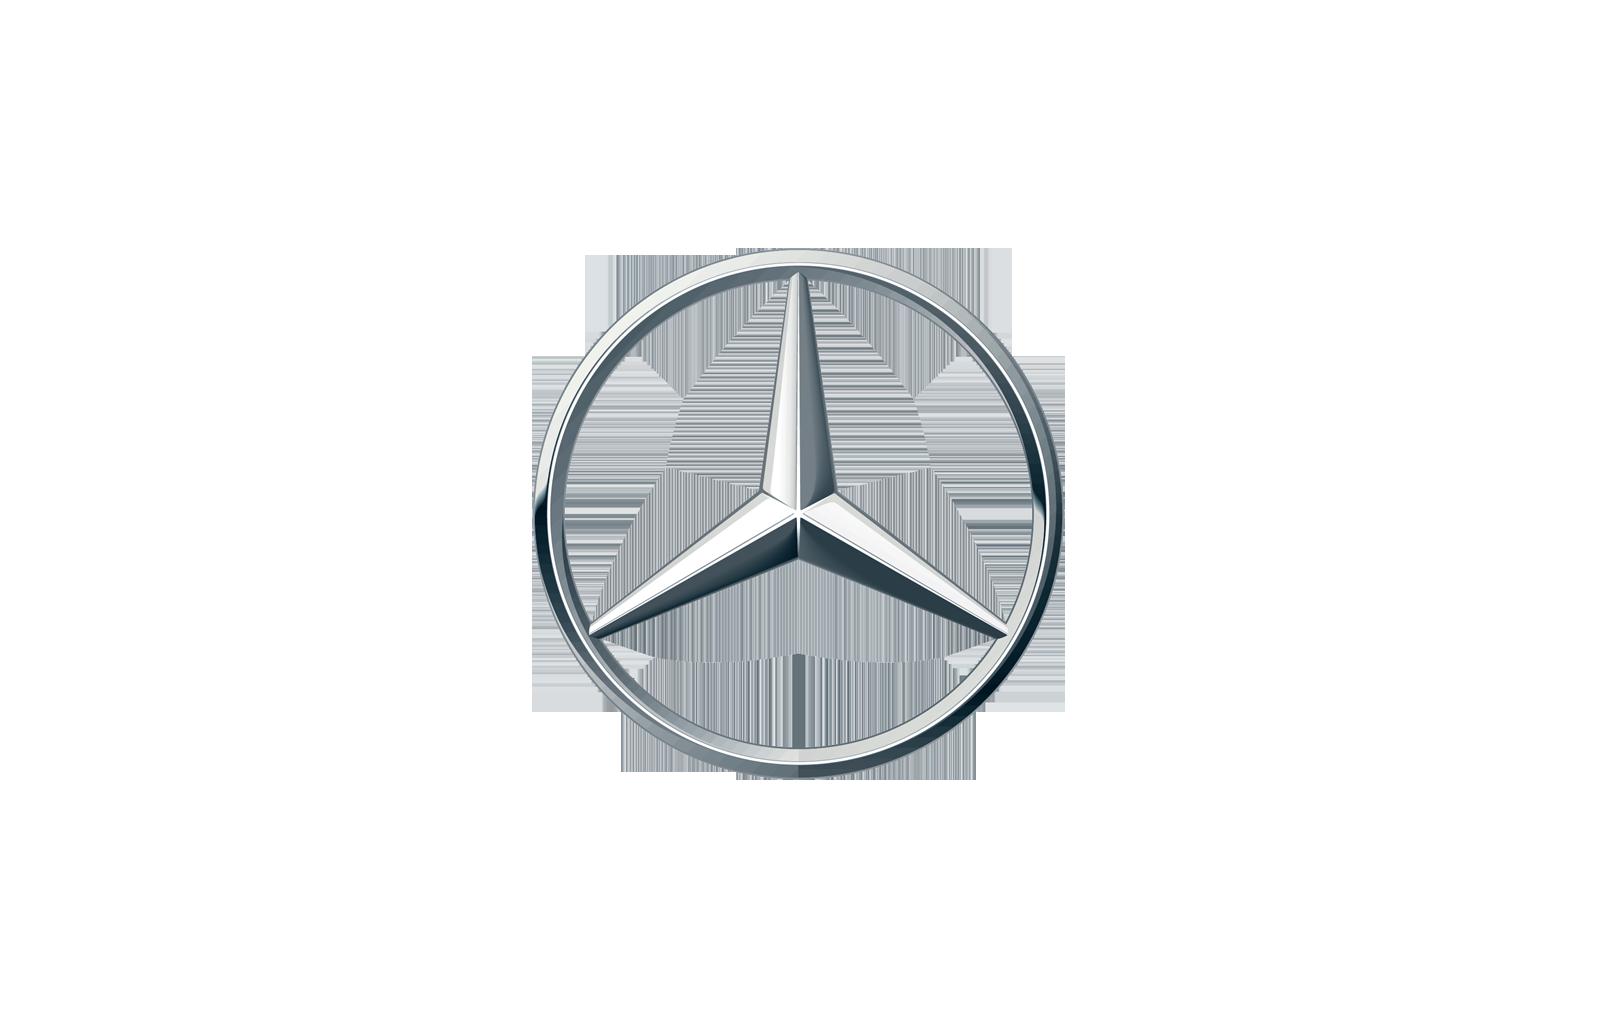 mercedes_logos_PNG1